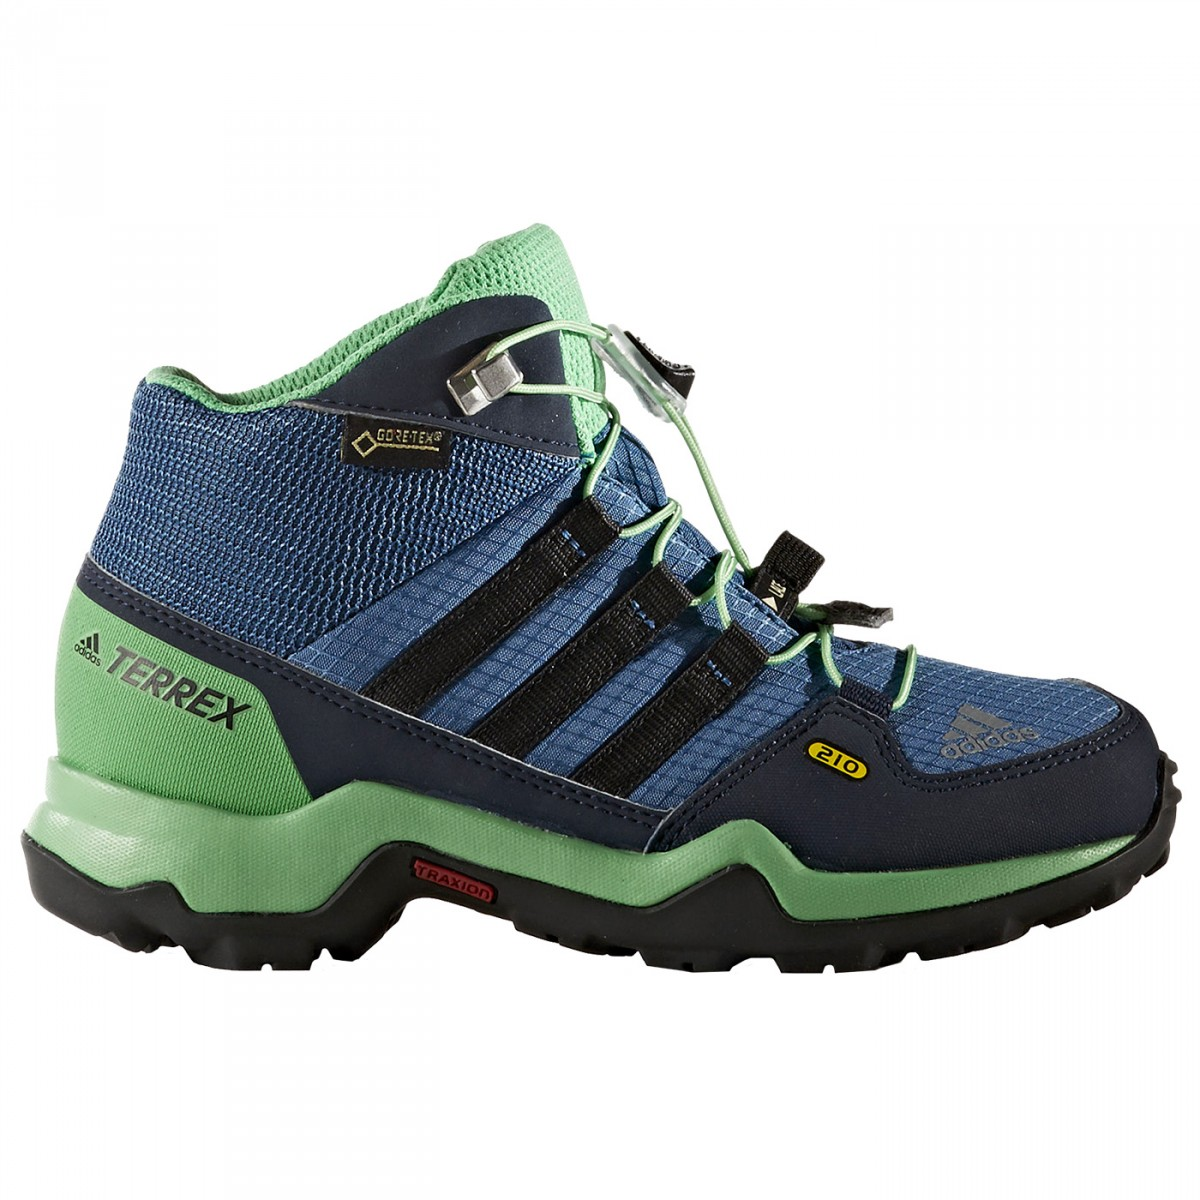 Calzature Terrex Adidas Swift Montagna Mid Trekking Scarpe Gtx Bambino O4qpOn